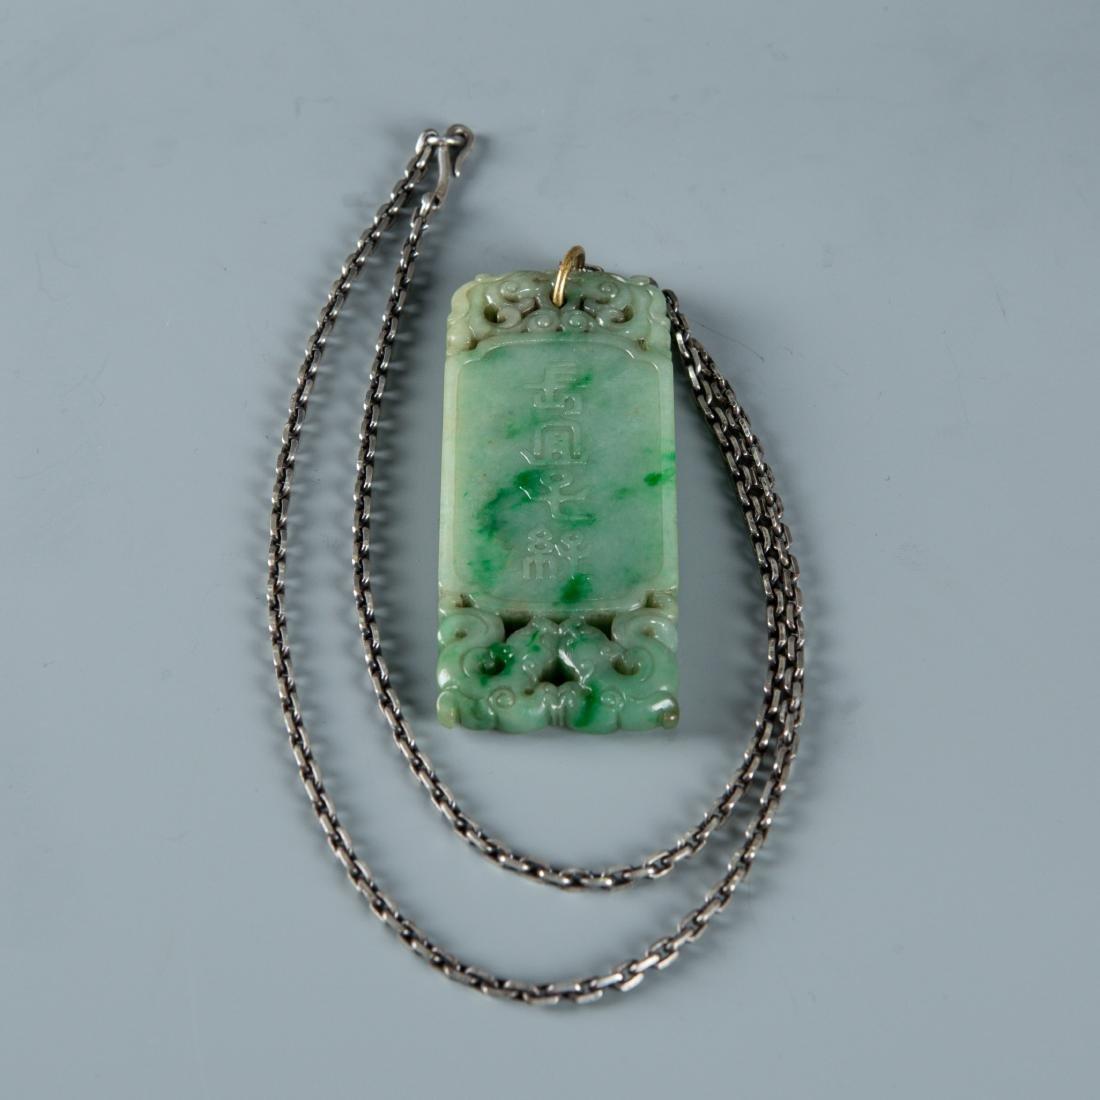 Jadeite Pendant on chain necklace - 5